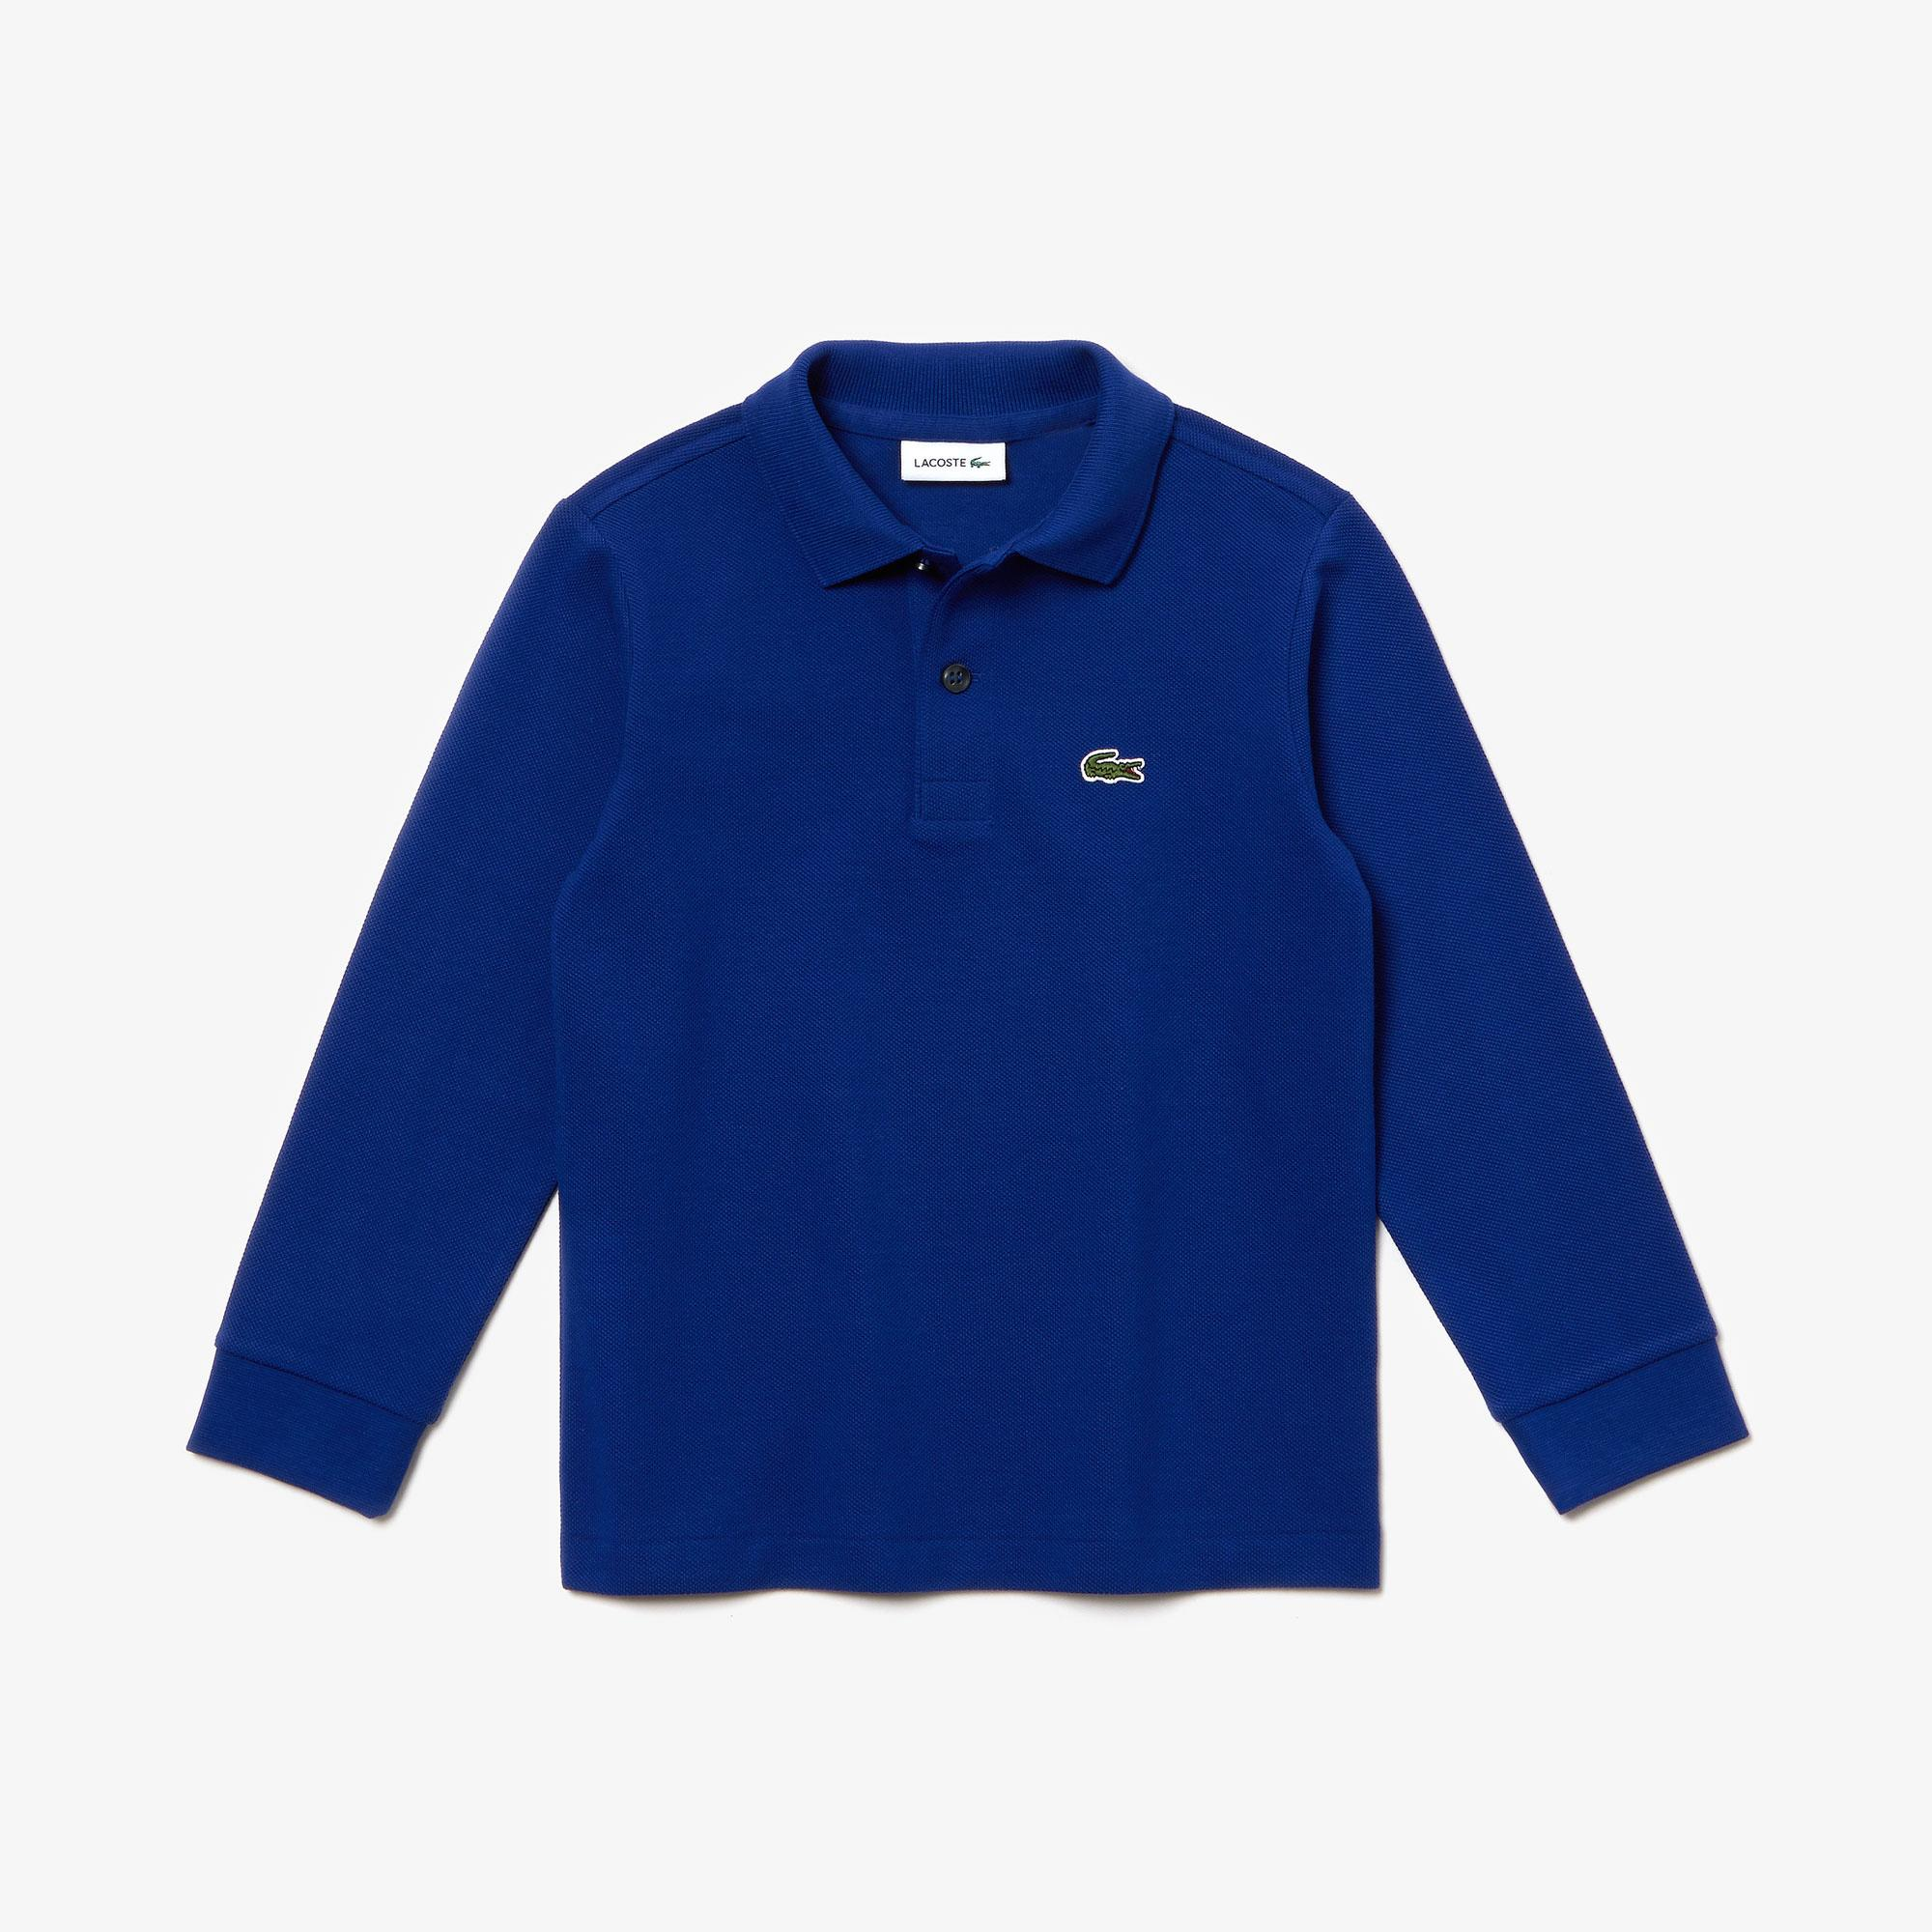 Lacoste Çocuk Uzun Kollu Mavi Polo